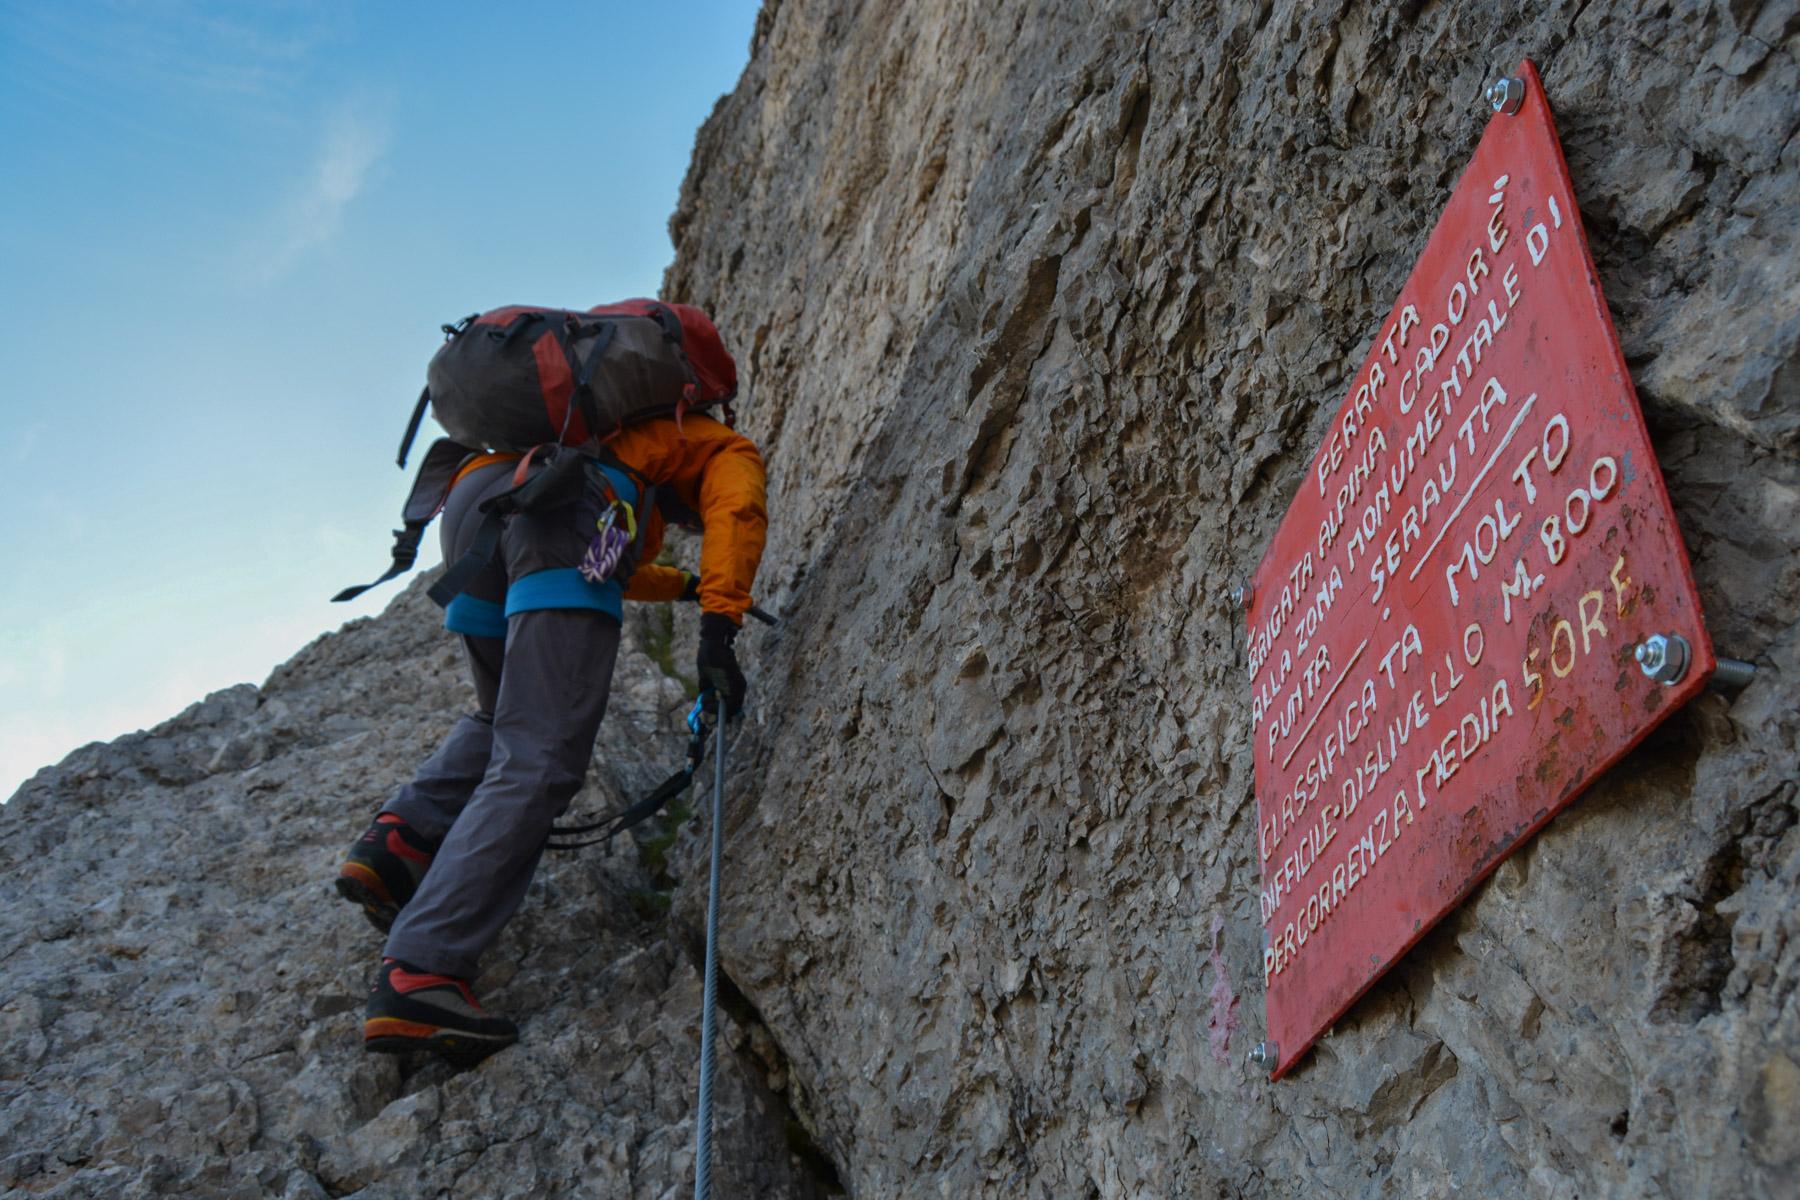 Via Eterna Brigata Cadore, Dolomites 7